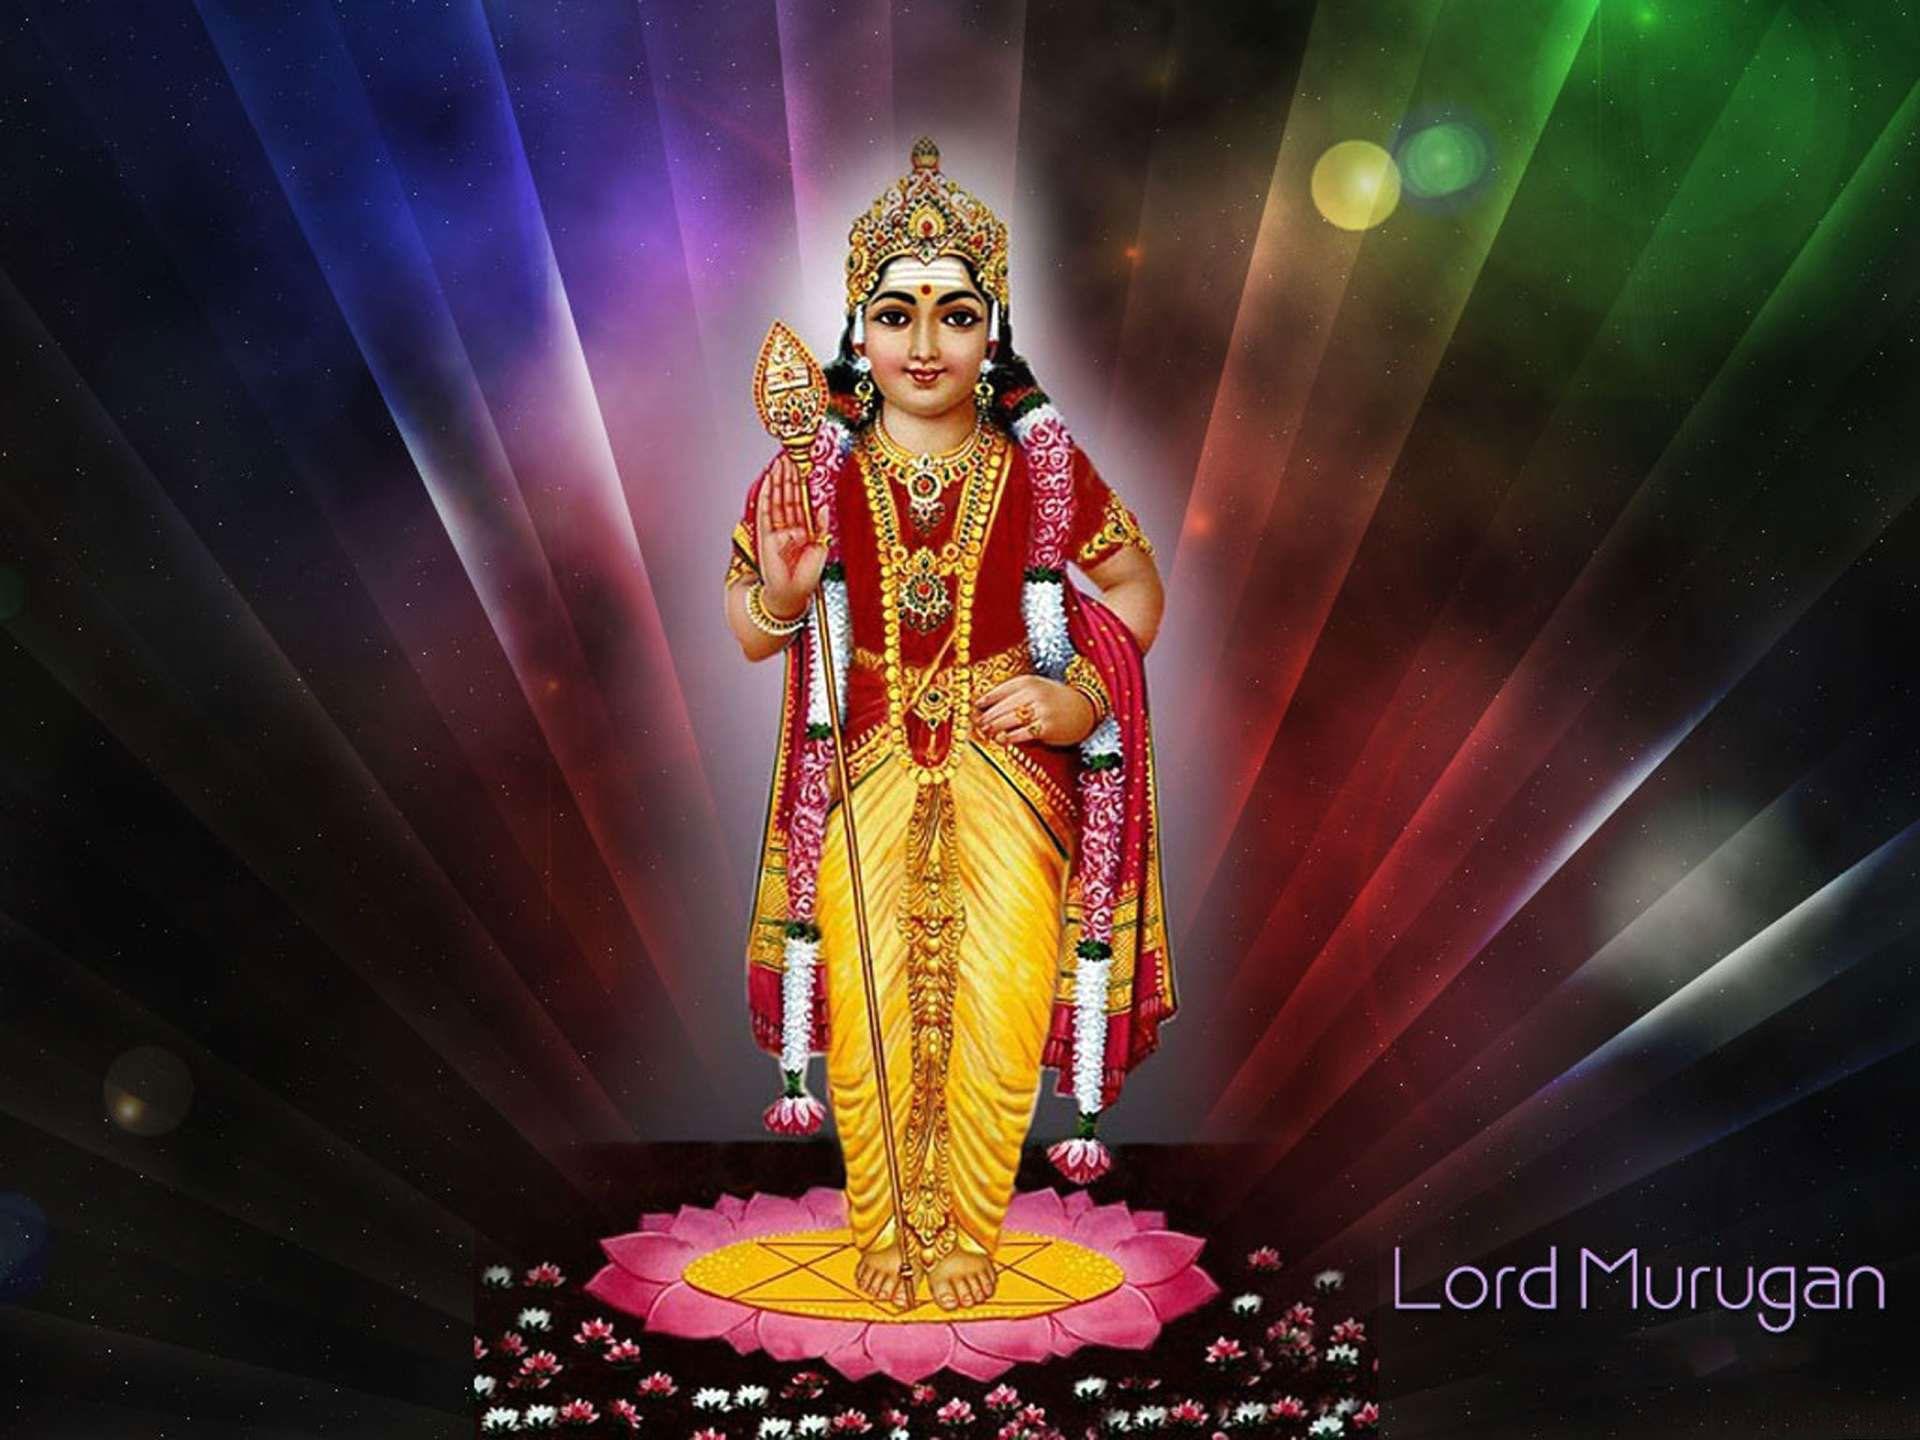 lord kartikeya hd wallpaper 1080p full size download lord